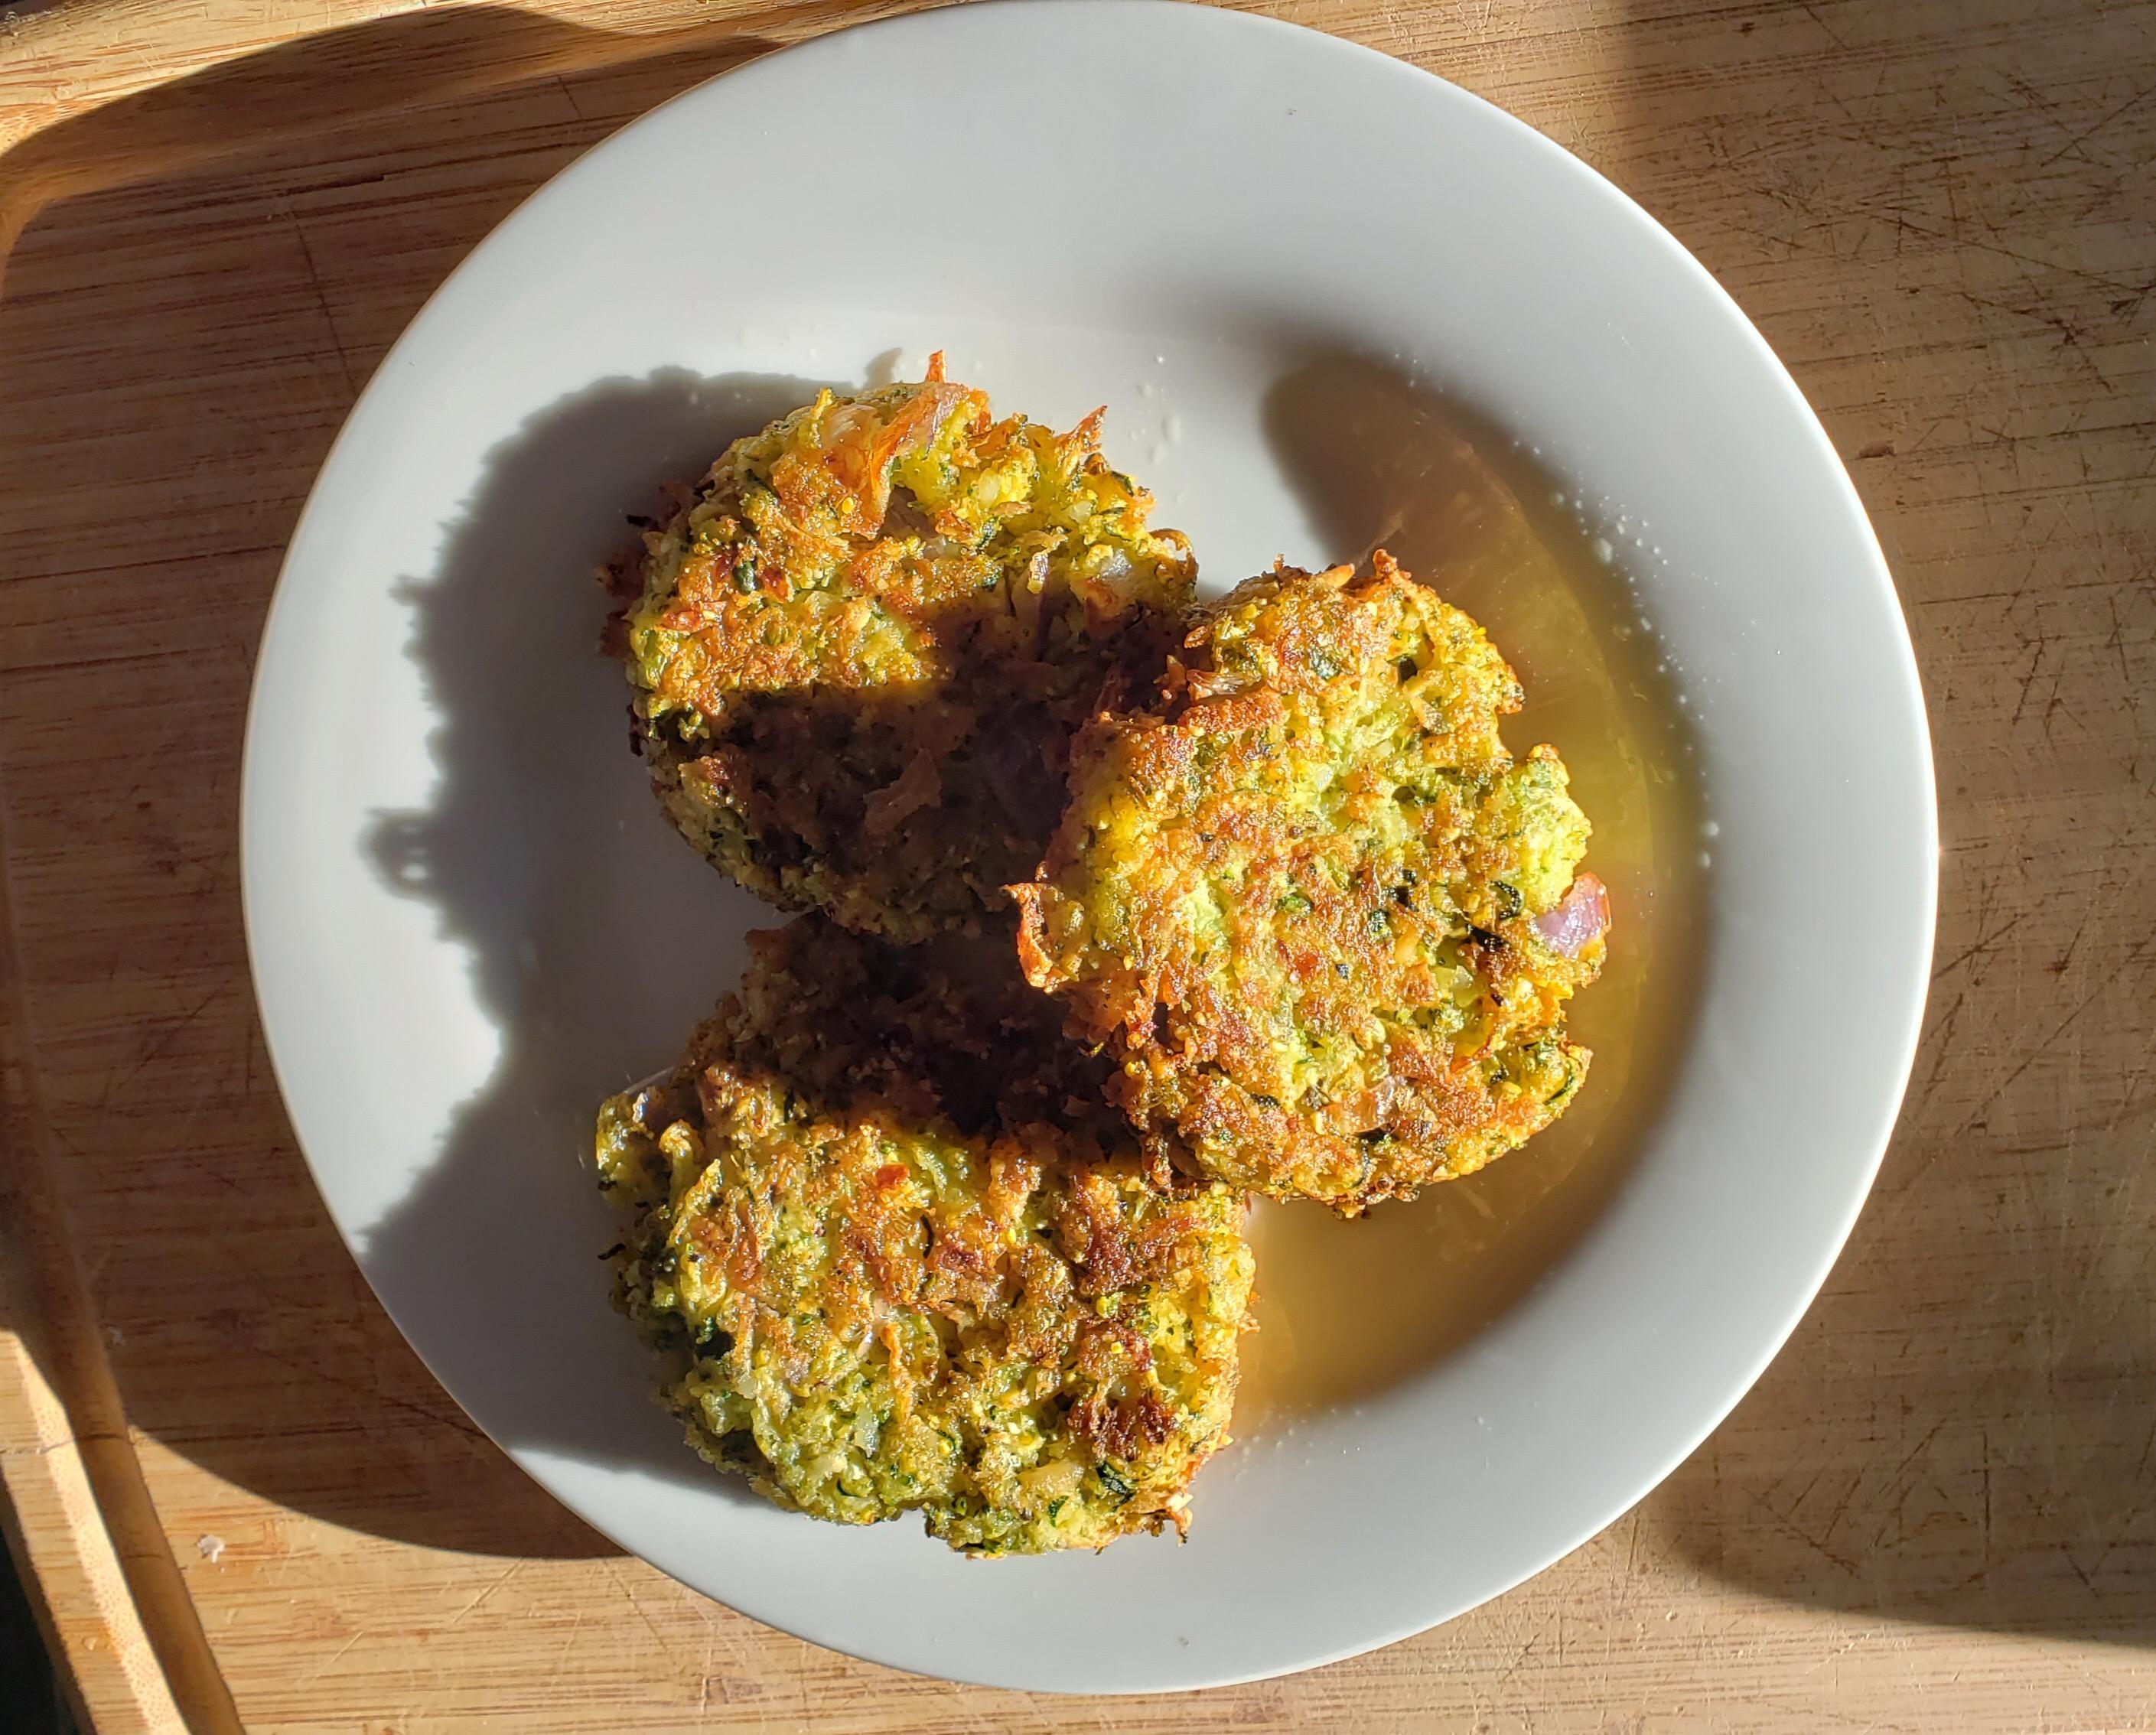 Zucchini-Parmesan Cheese Fritters